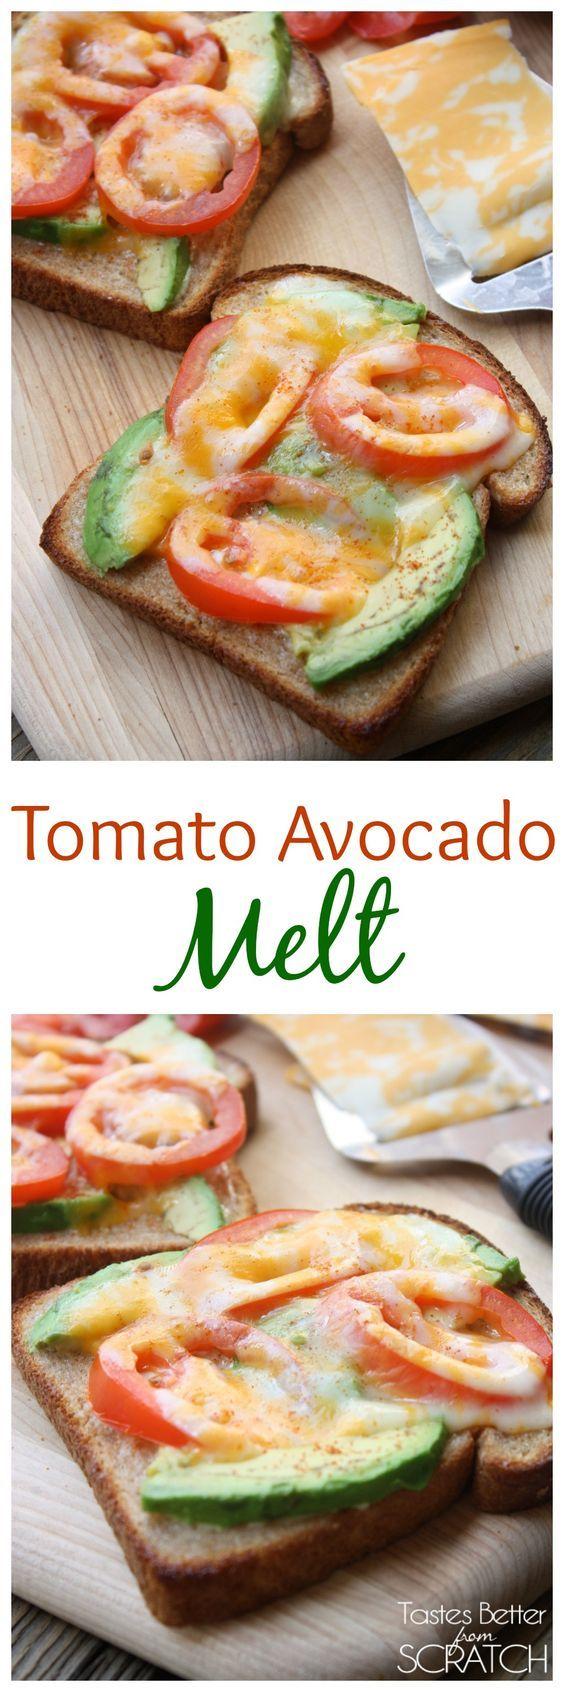 Tomato Avocado Melt